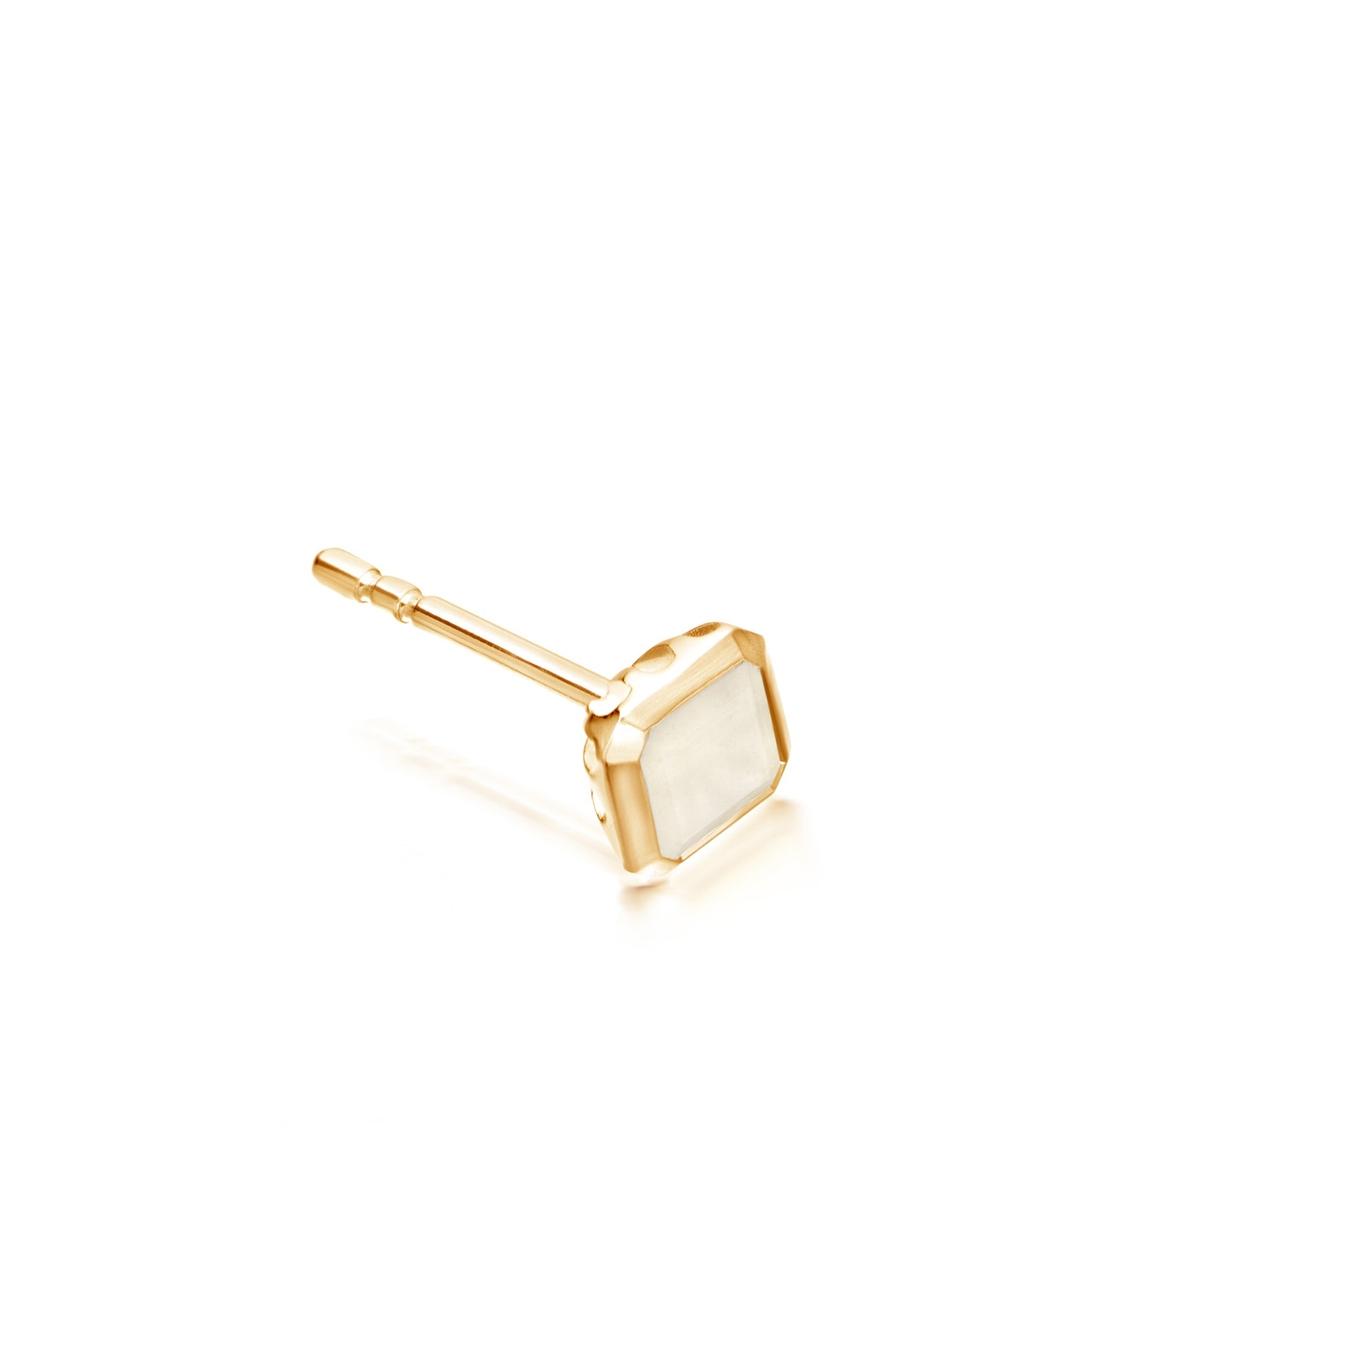 Moonstone Square Prismic Single Stud Earring